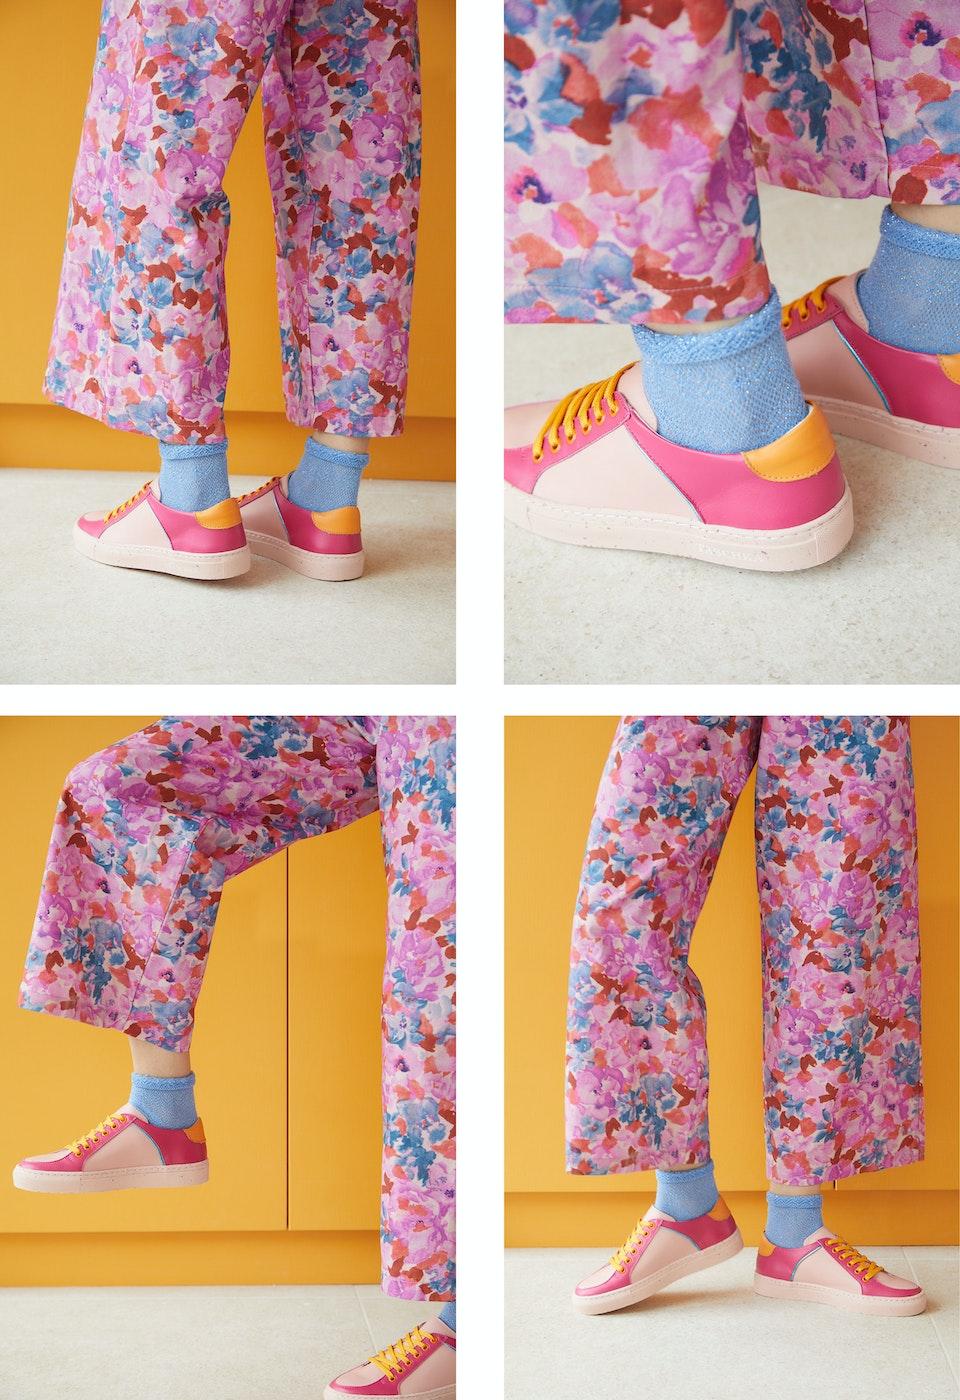 TaschkaShoes_009 -